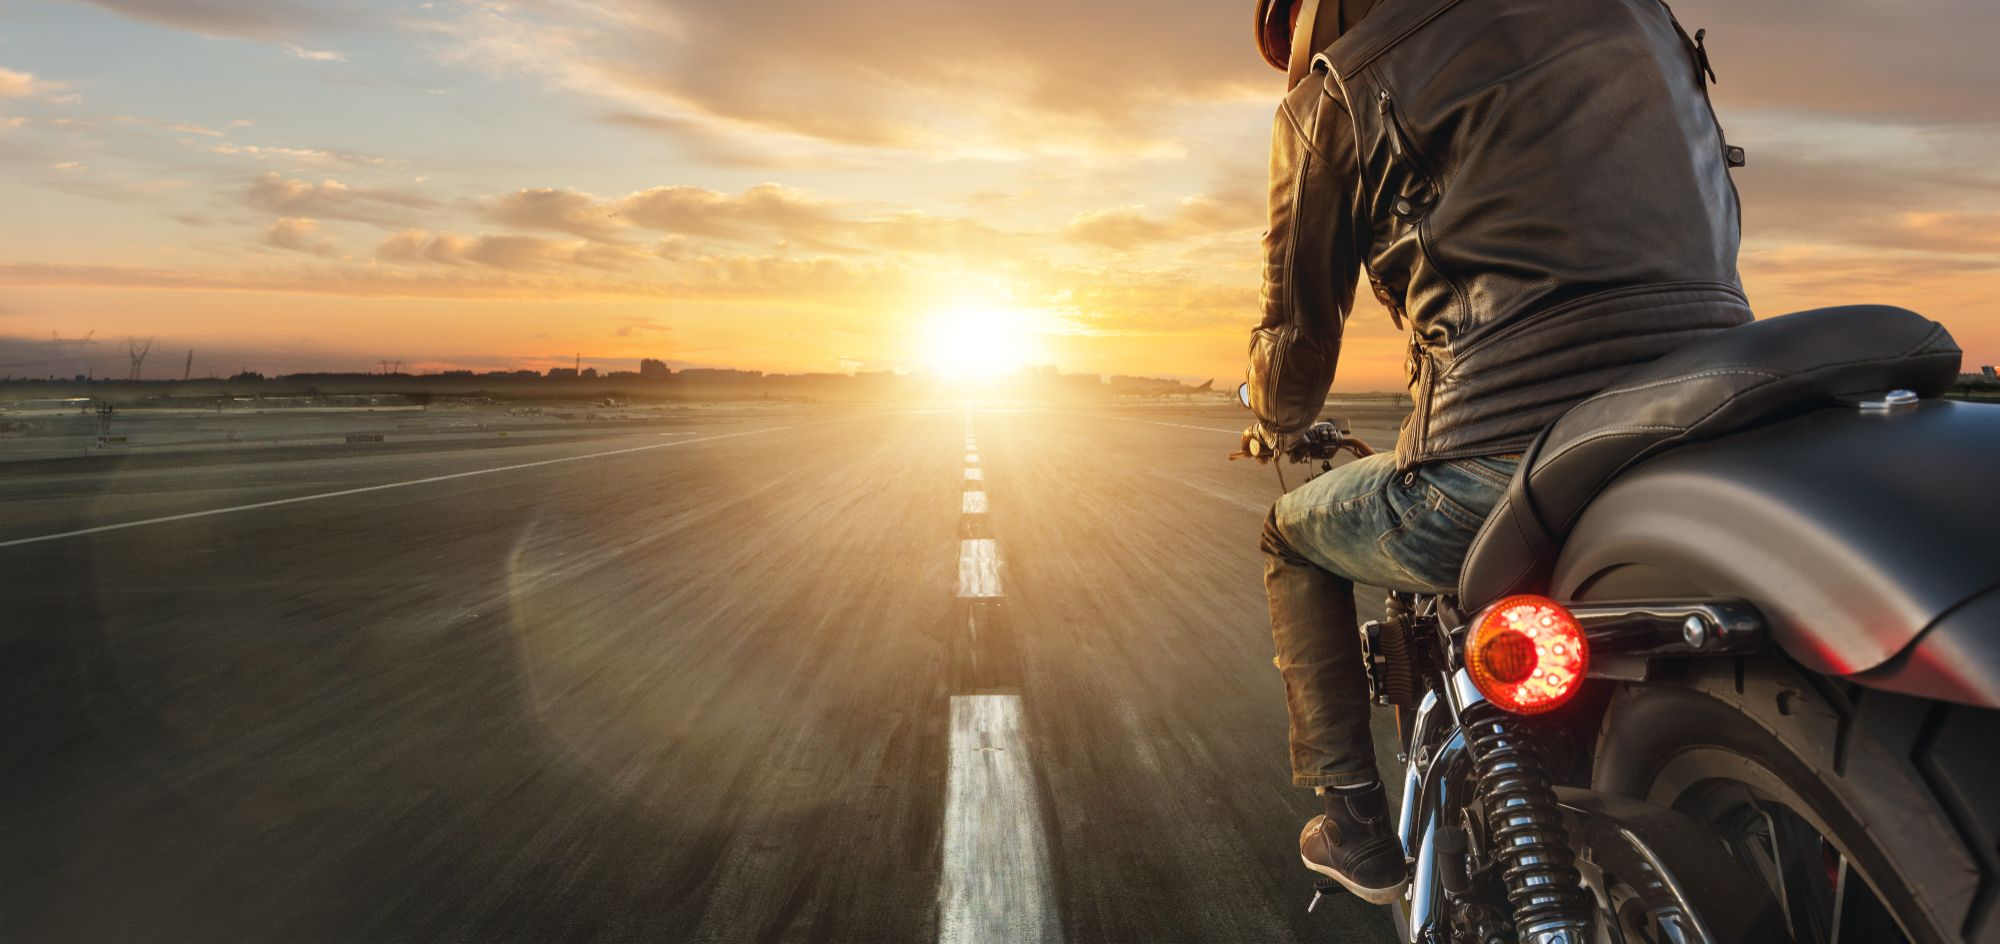 assurance moto quebec prix